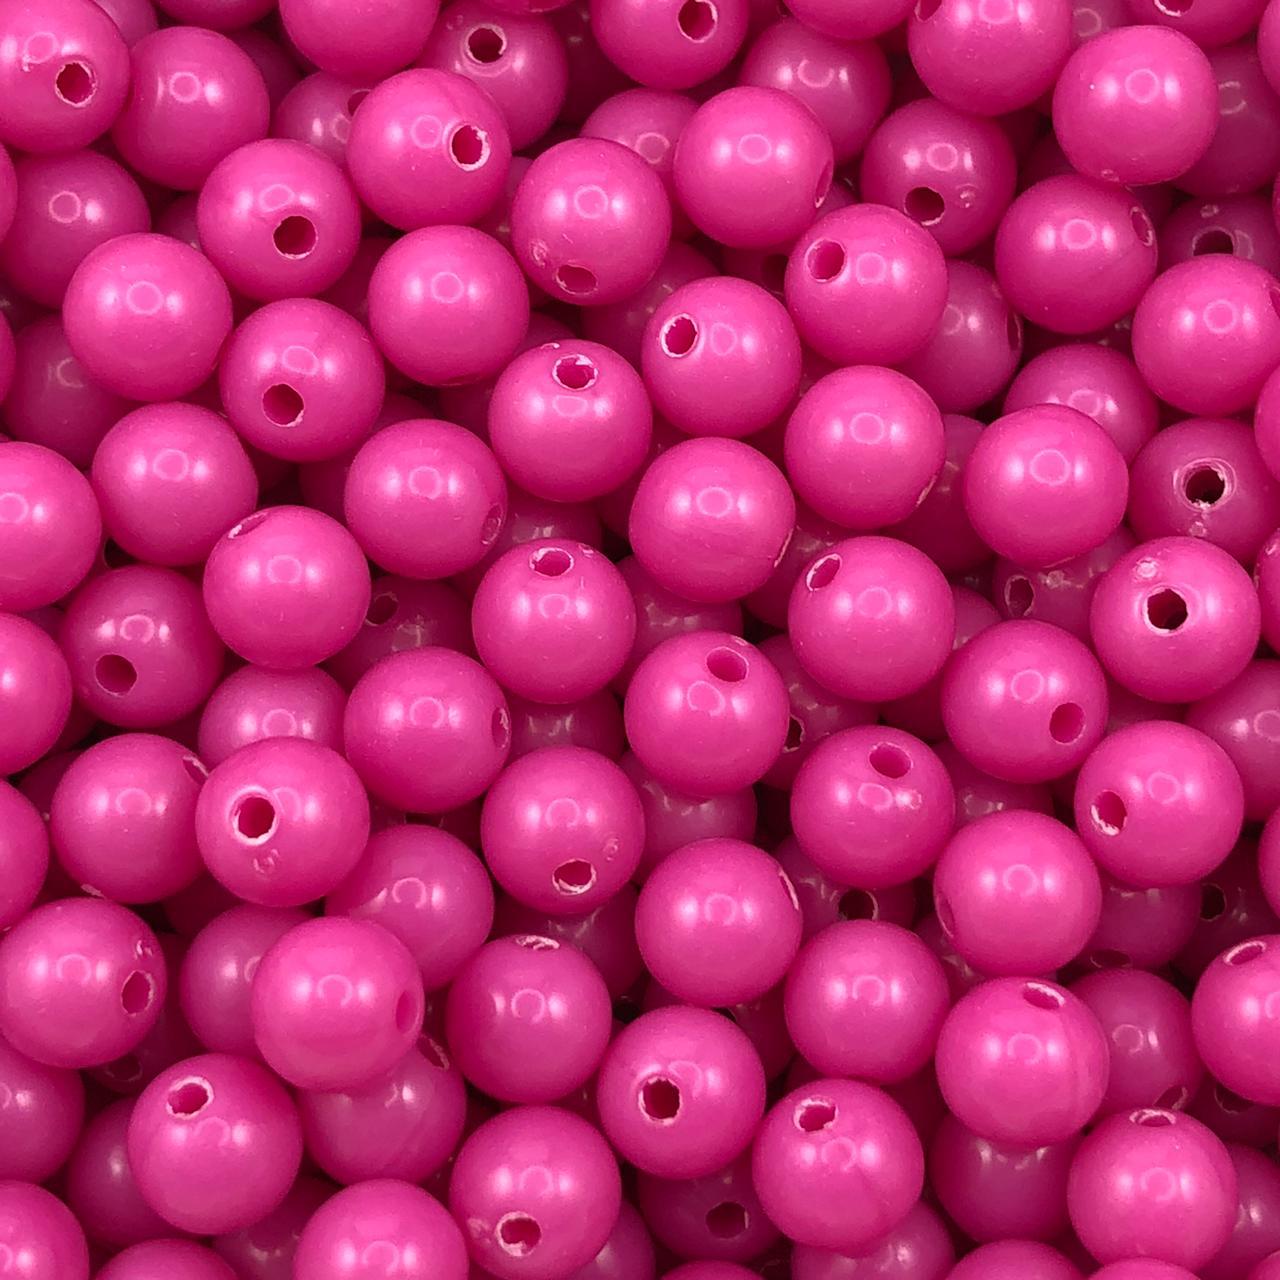 BOL650 - Bola Plástica Rosa 8mm - 20Grs